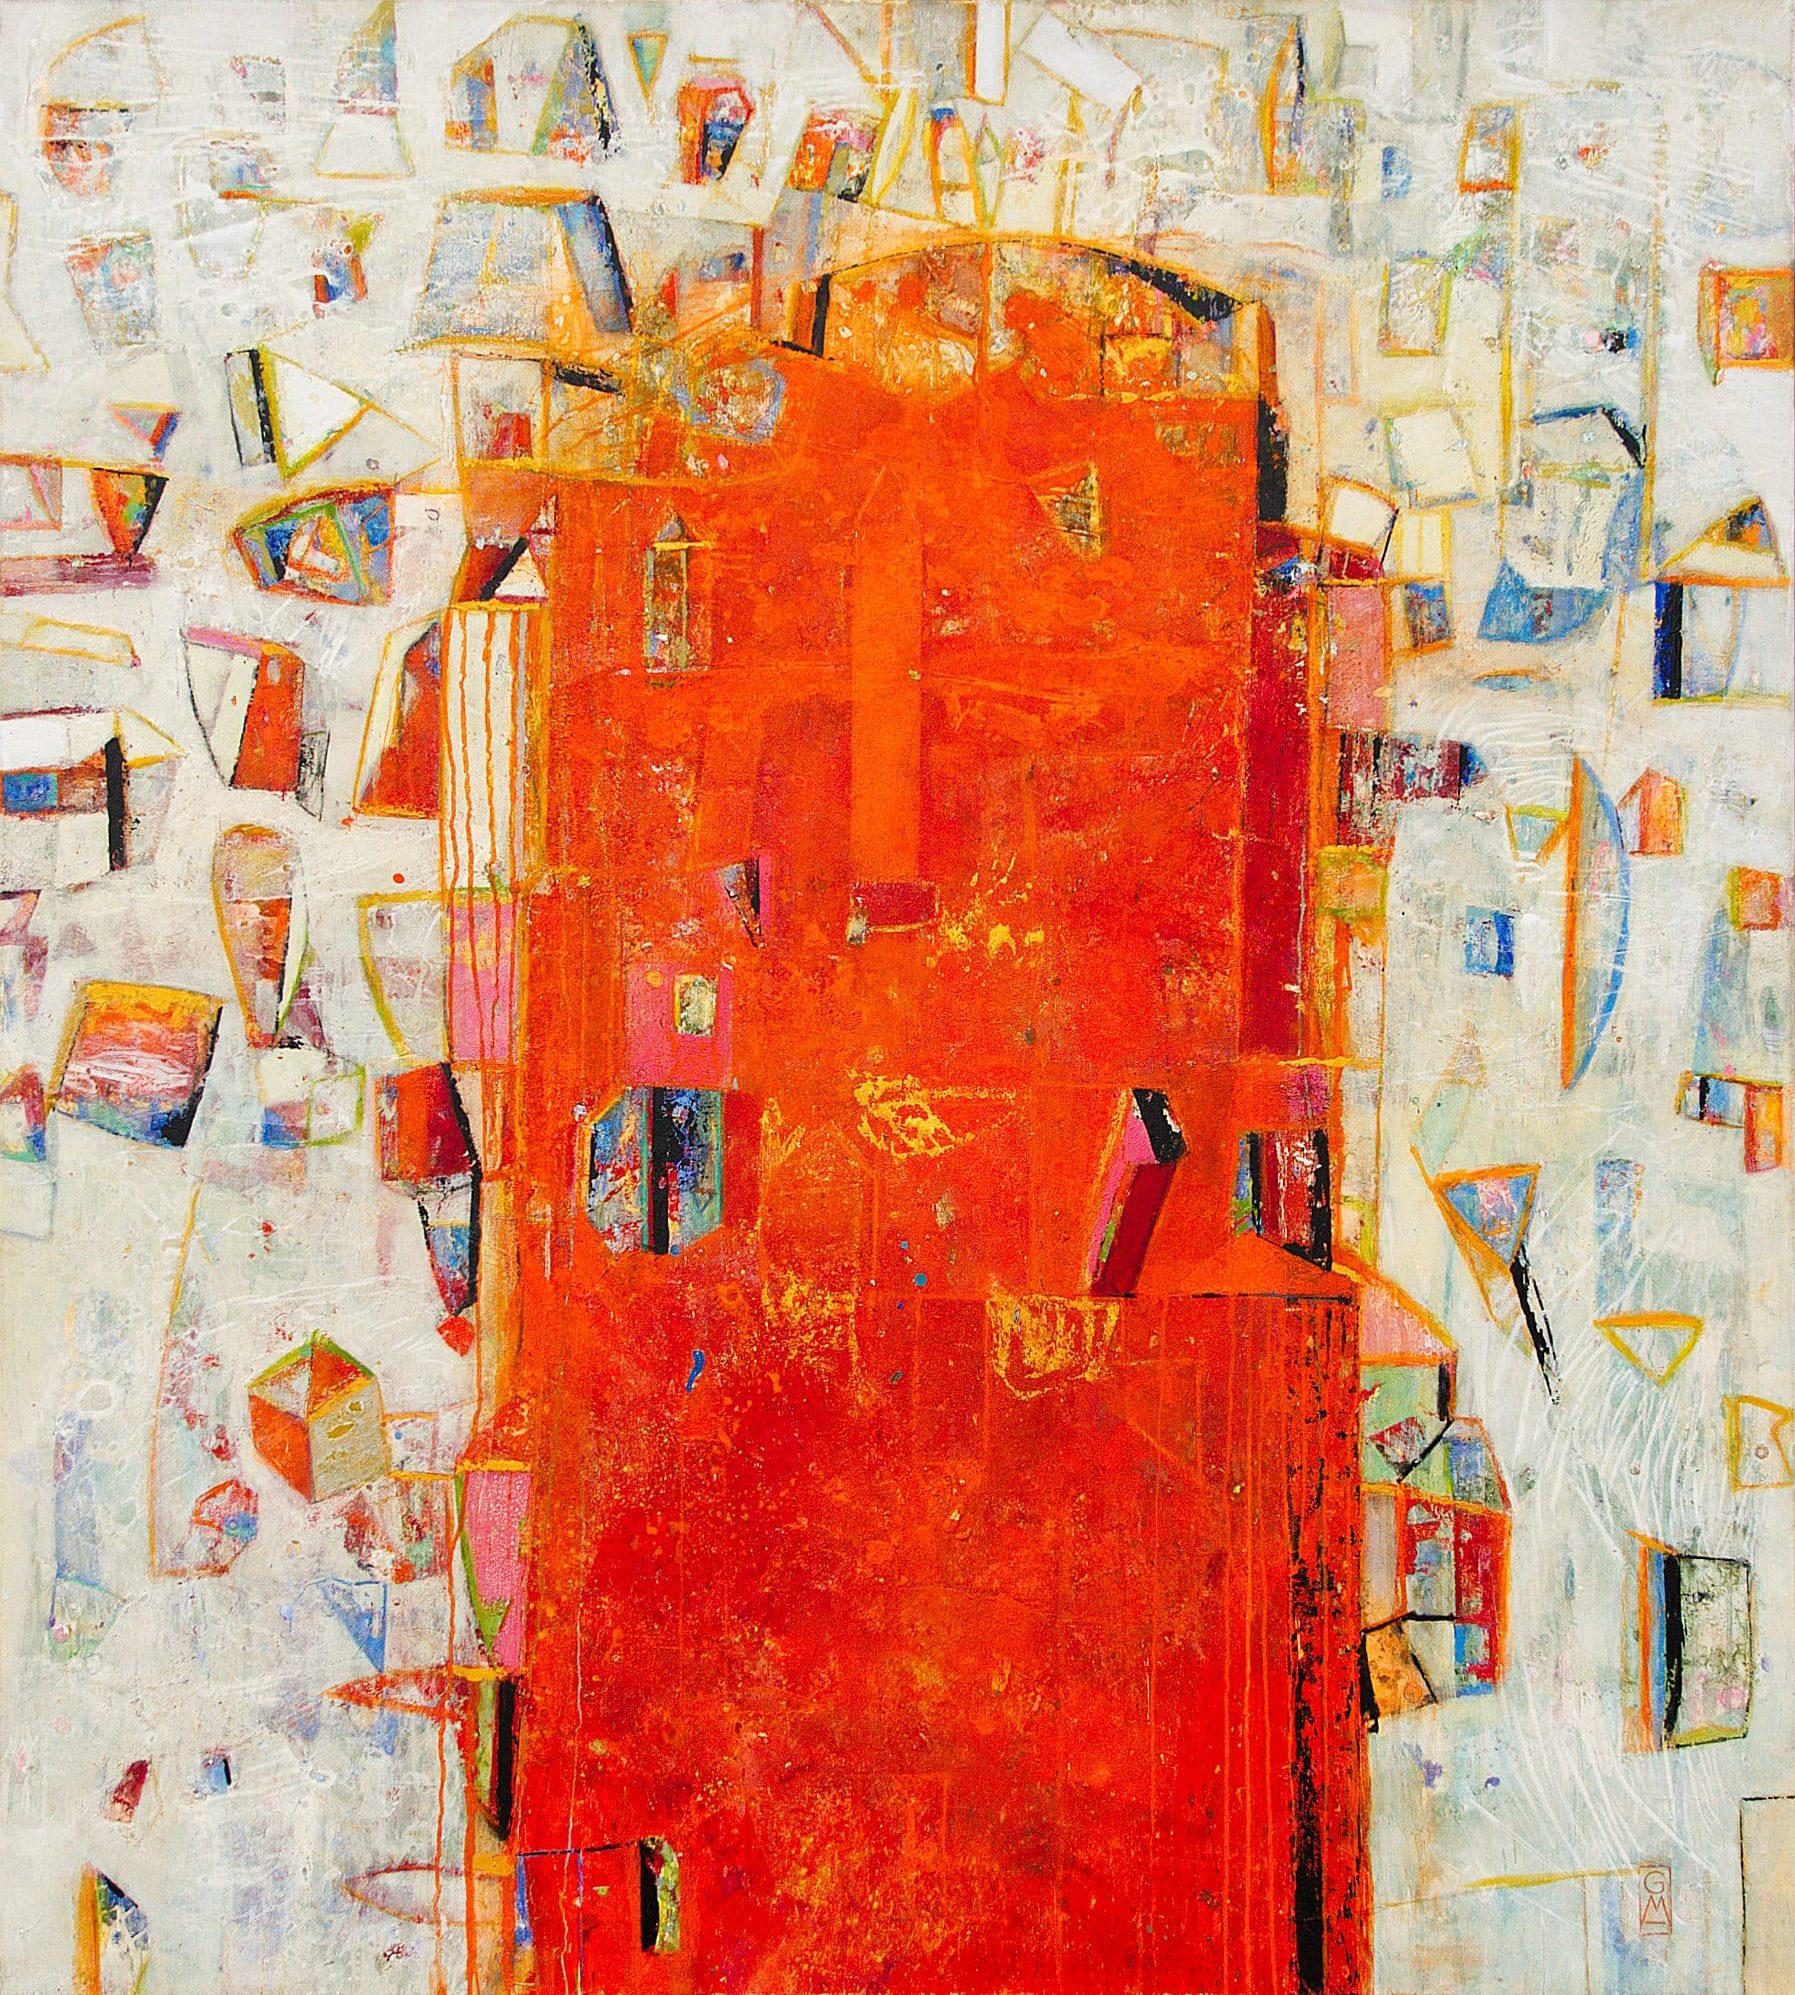 Gerlinde Mader | Rote Stehle | 140 x 150 cm | 2010/11